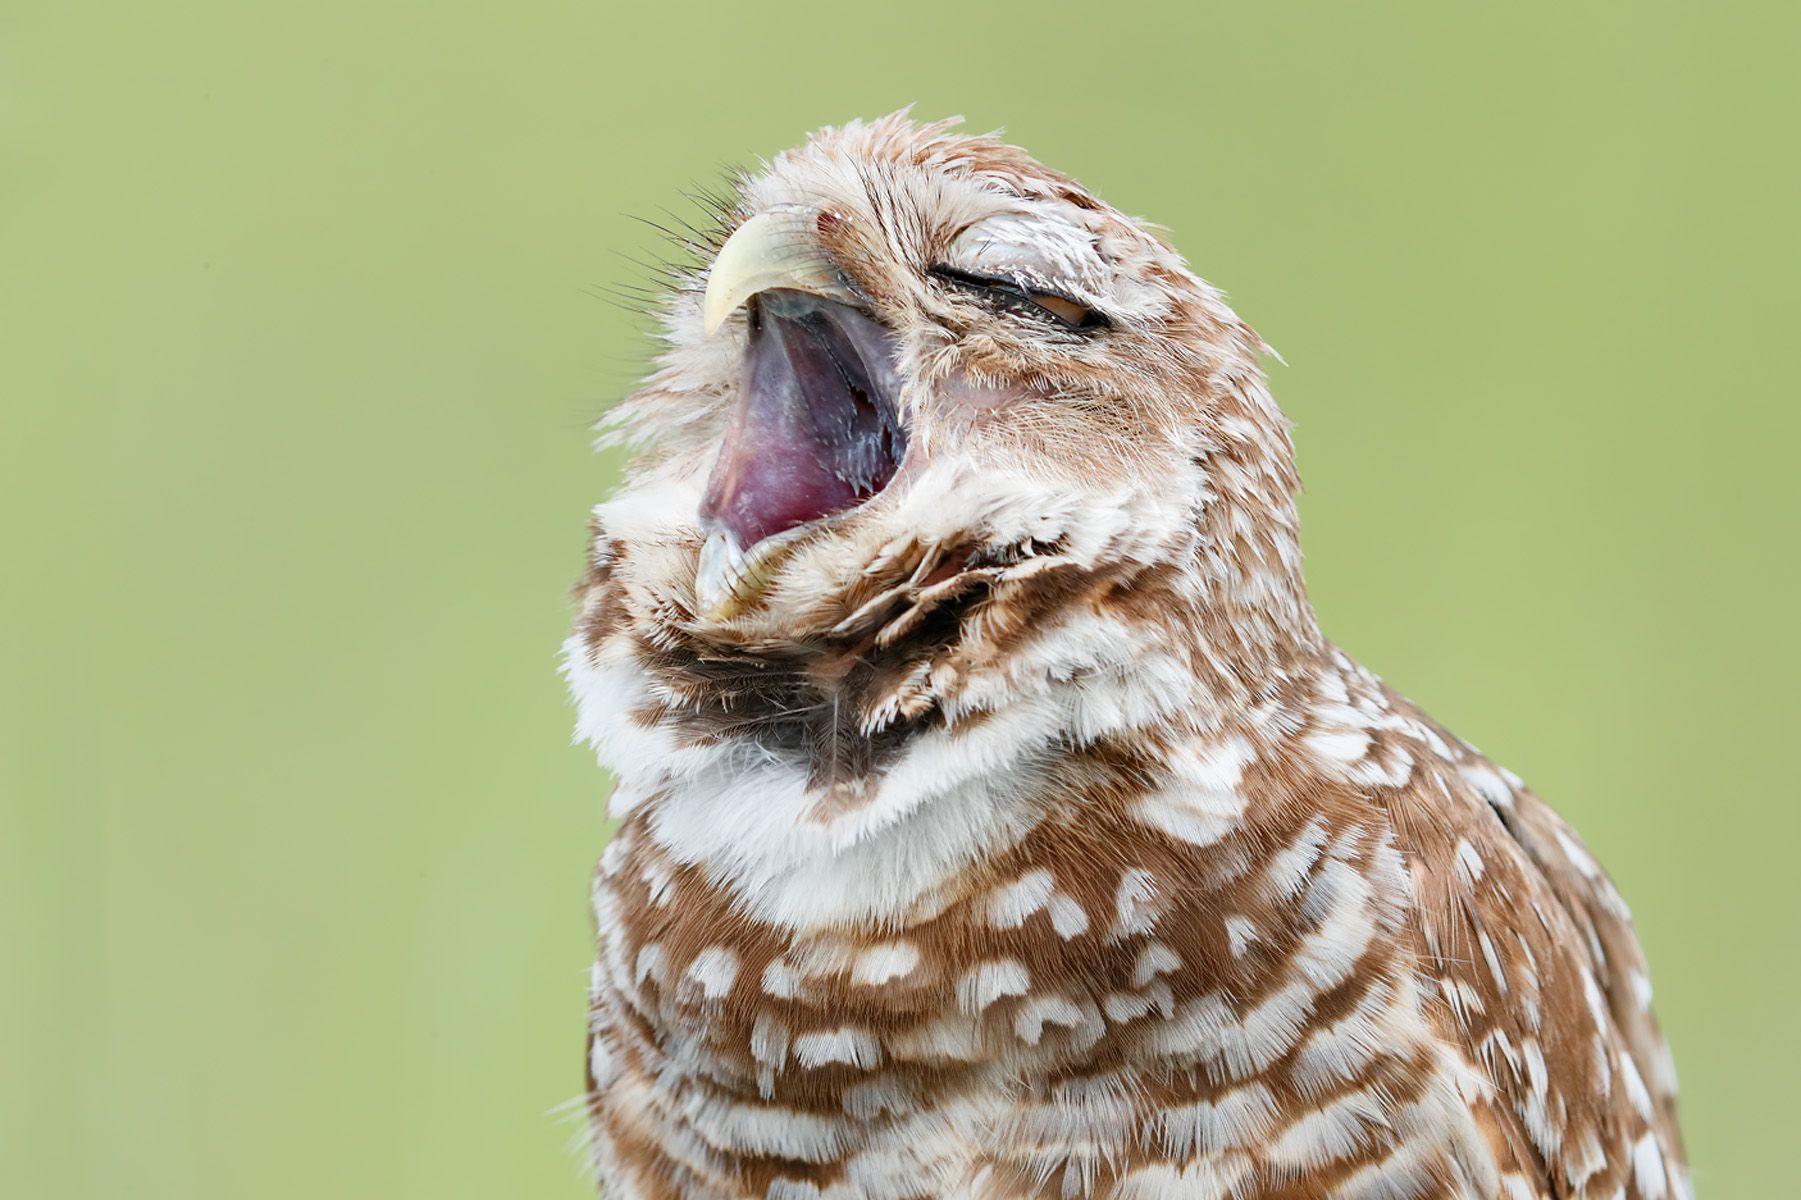 Burrowing owl yawning_A3I9133- Boca Raton Airport, FL, USA.jpg